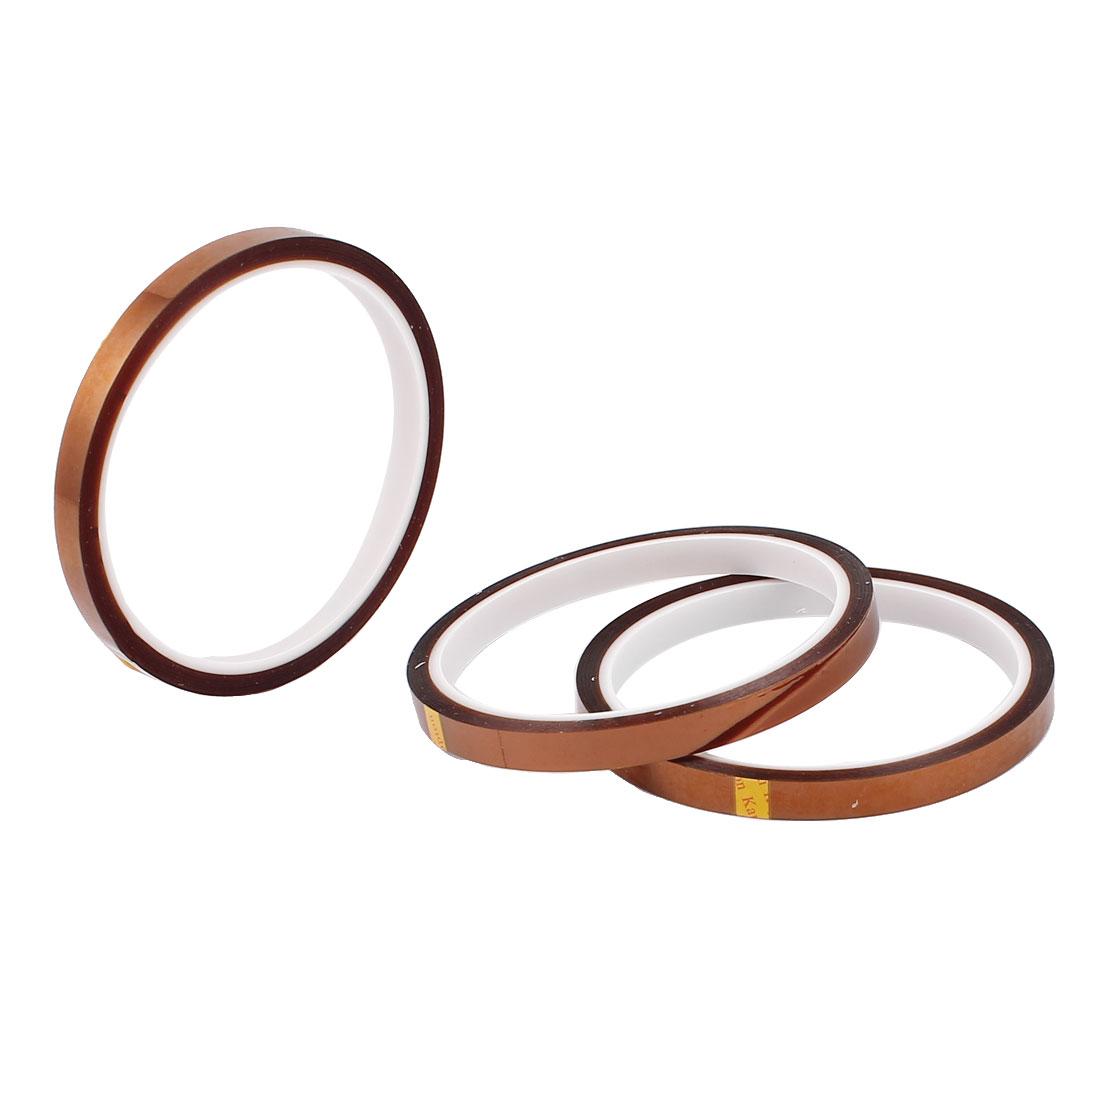 8mm Width 90mm Diameter High Temperature Resistant Tape 3Pcs